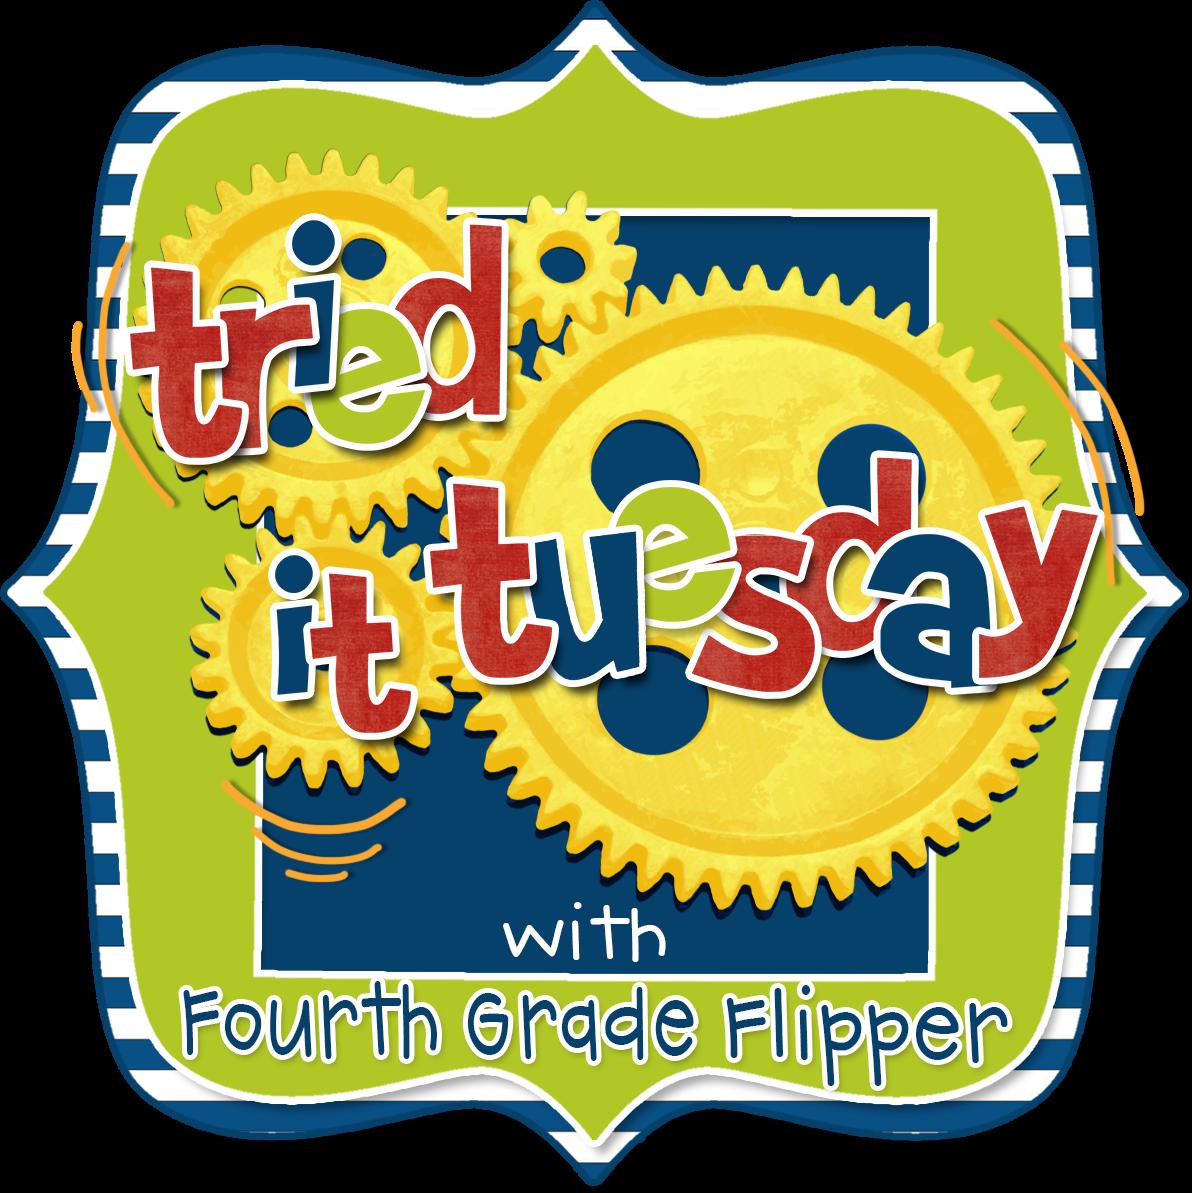 100 book challenge clipart svg free Fourth Grade Flipper: Tried It Tuesday {Book Challenge} svg free